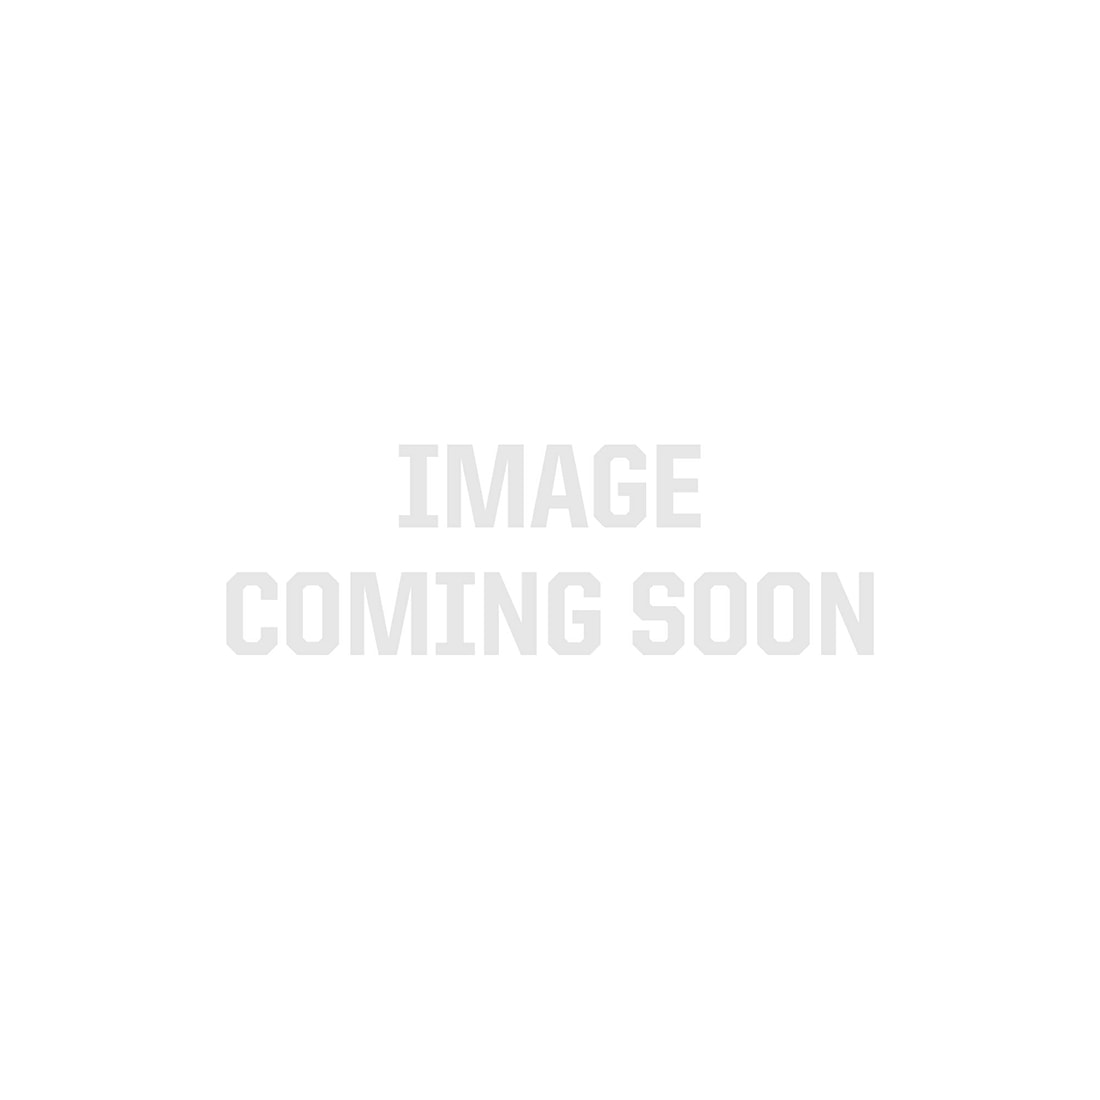 Soft White 5630 Single Row CurrentControl LED Strip Light, 126/m, 12mm wide, Sample Kit